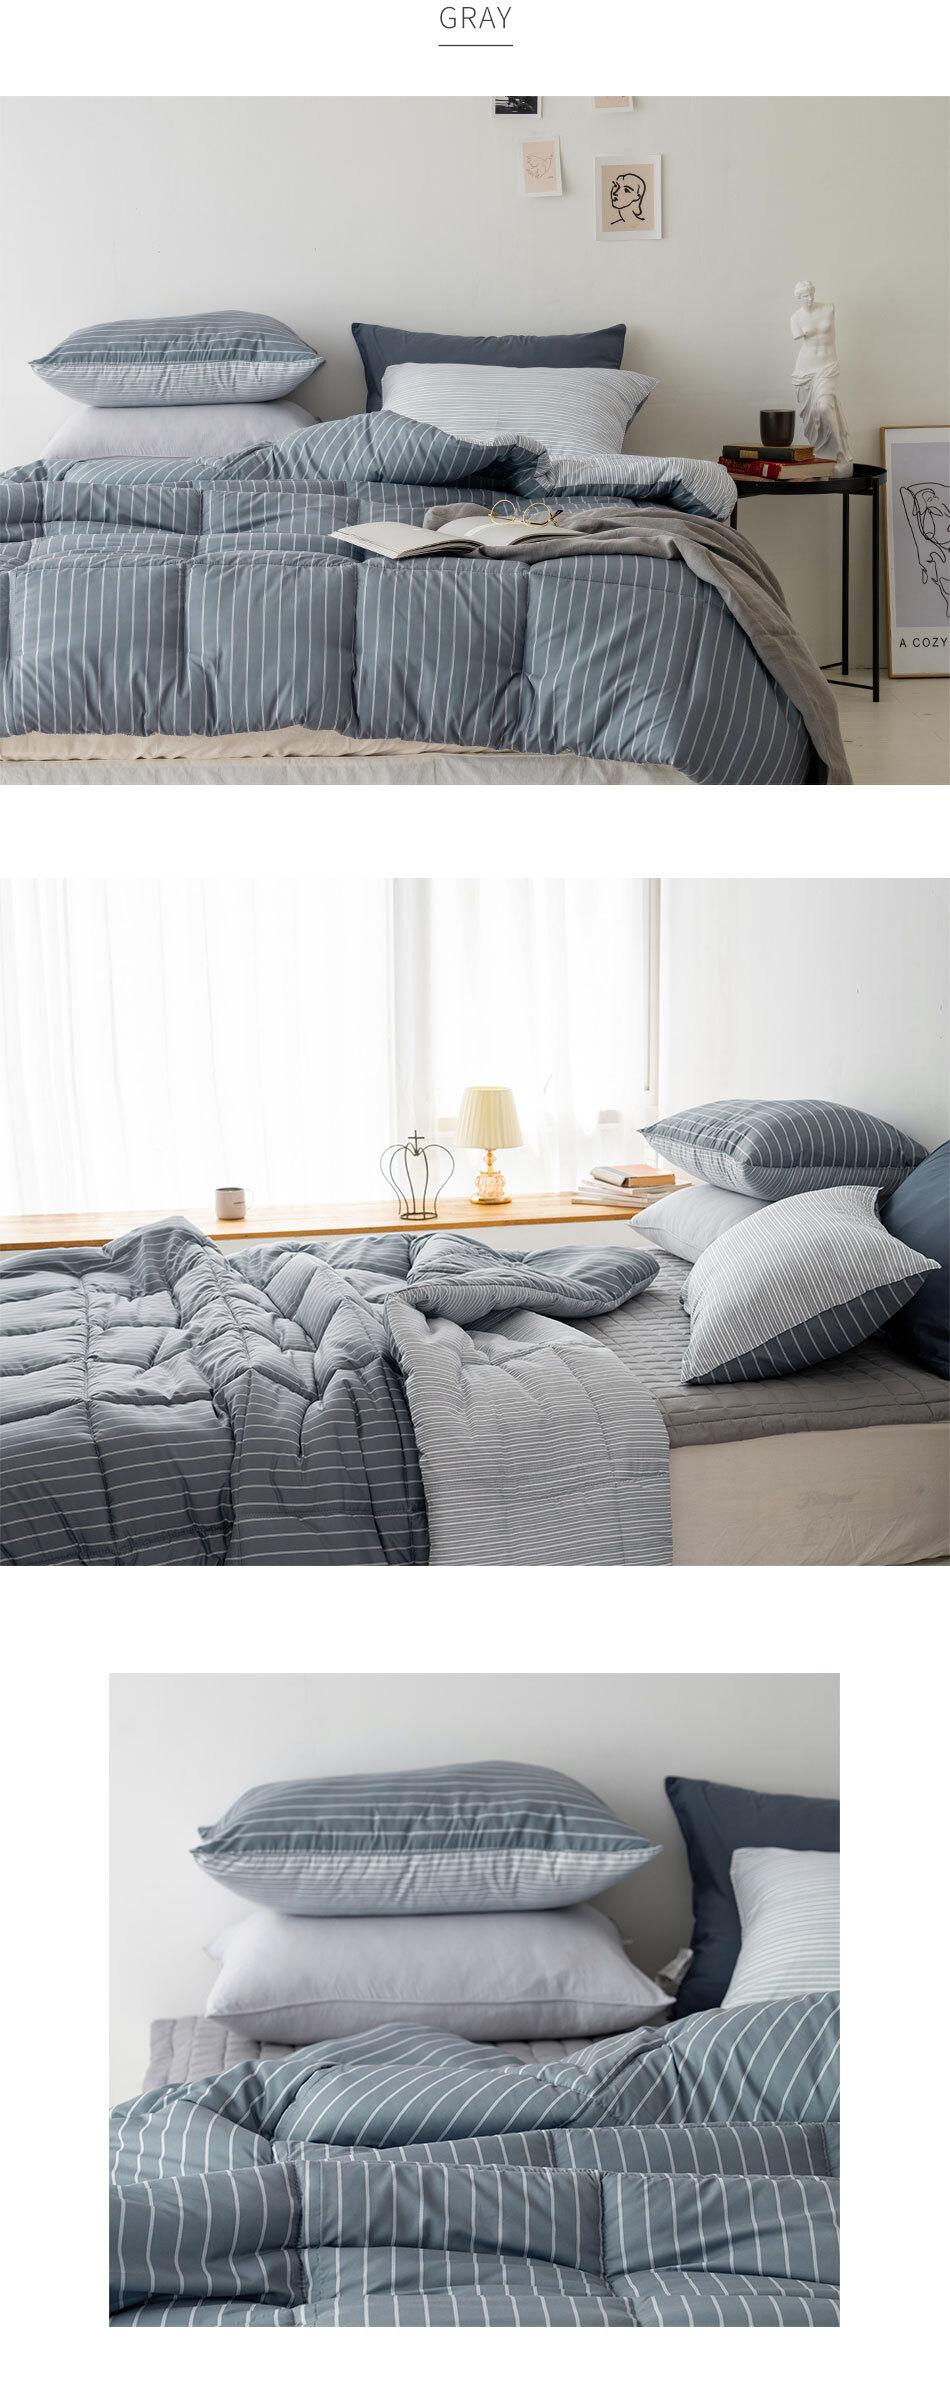 urban_bed_gray_01.jpg